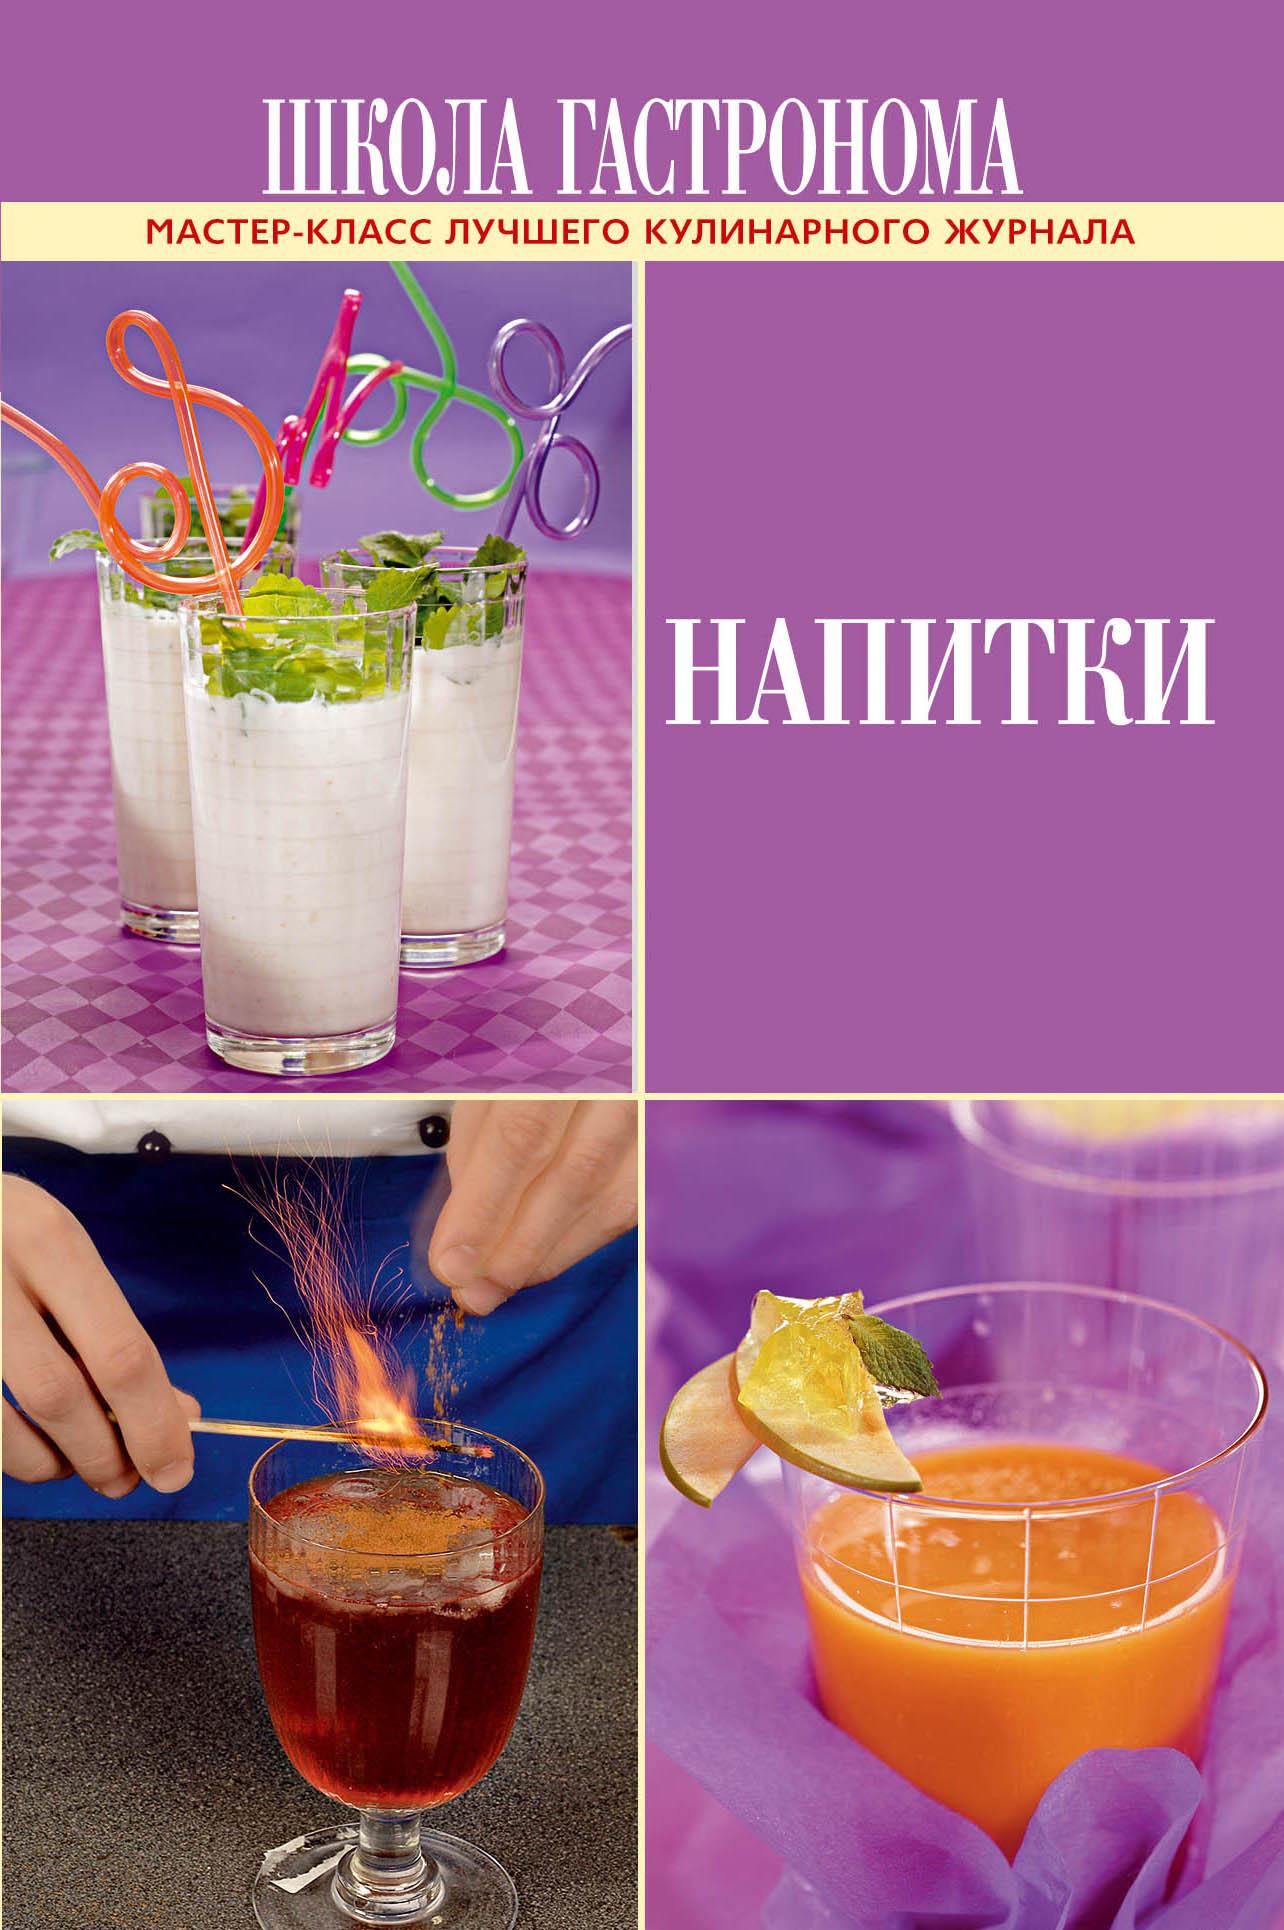 Школа Гастронома. Напитки от book24.ru